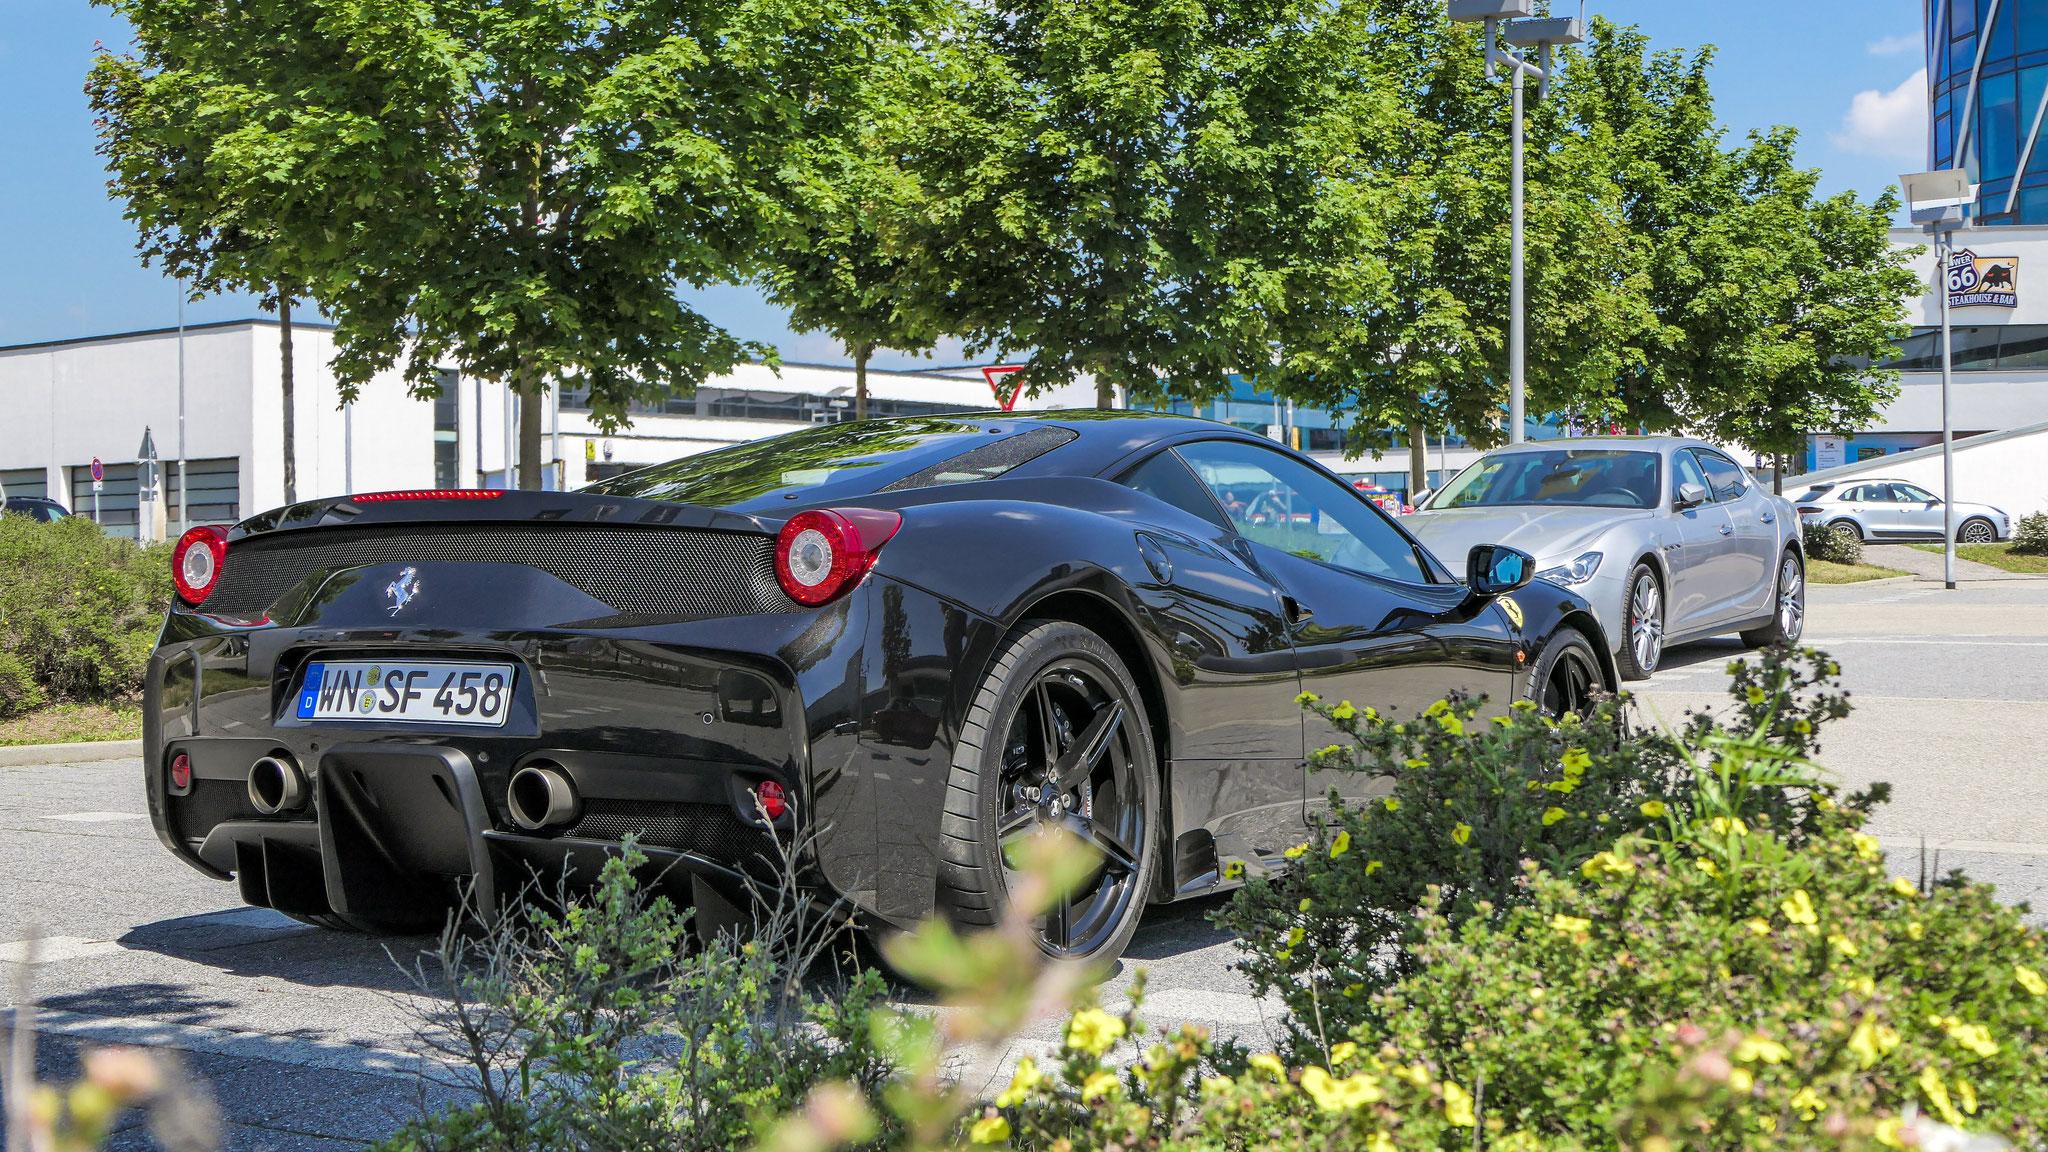 Ferrari 458 Speciale - WN-SF-458